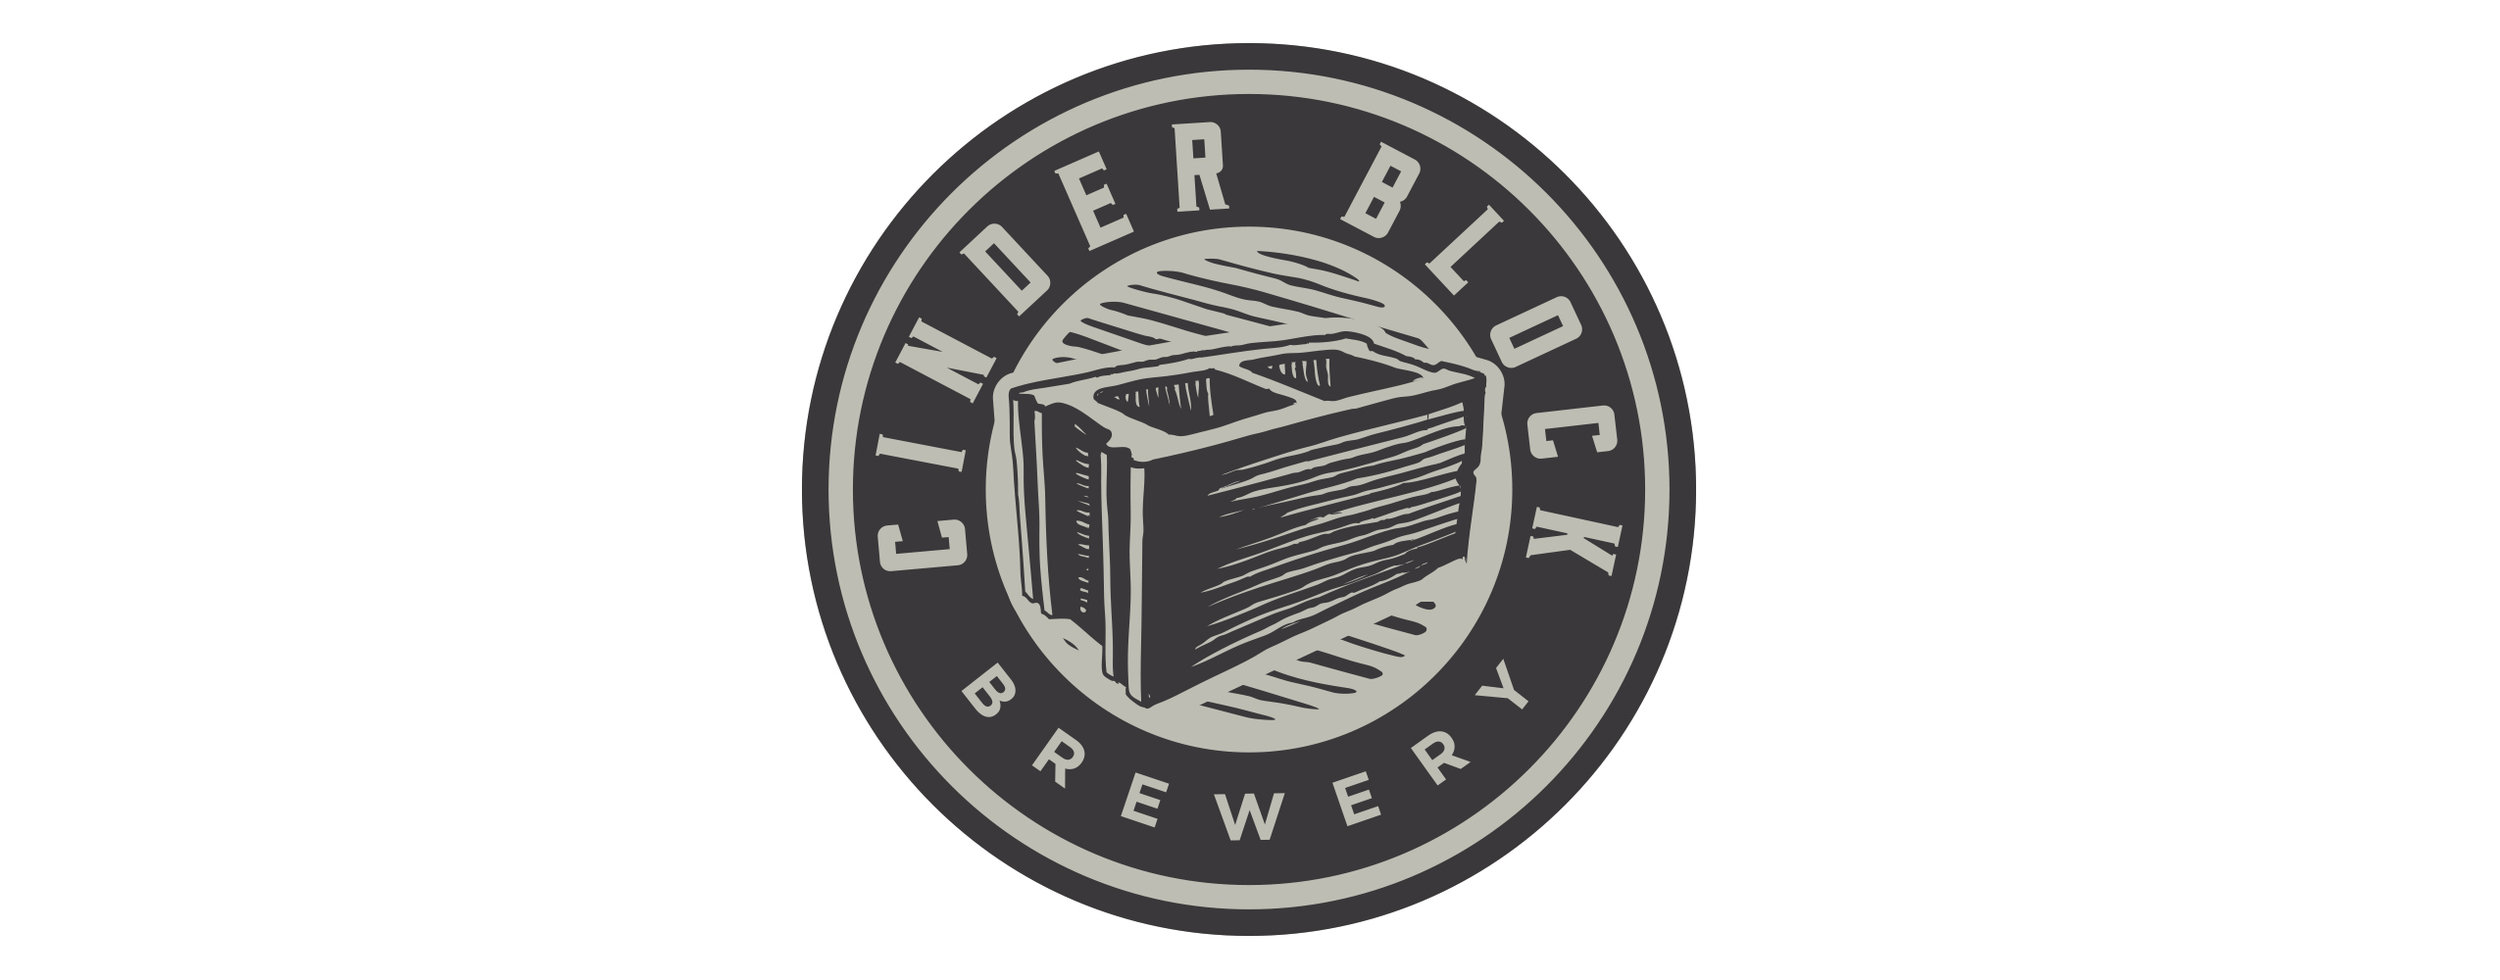 CBB_Secondary_Logo (1) (3).jpg